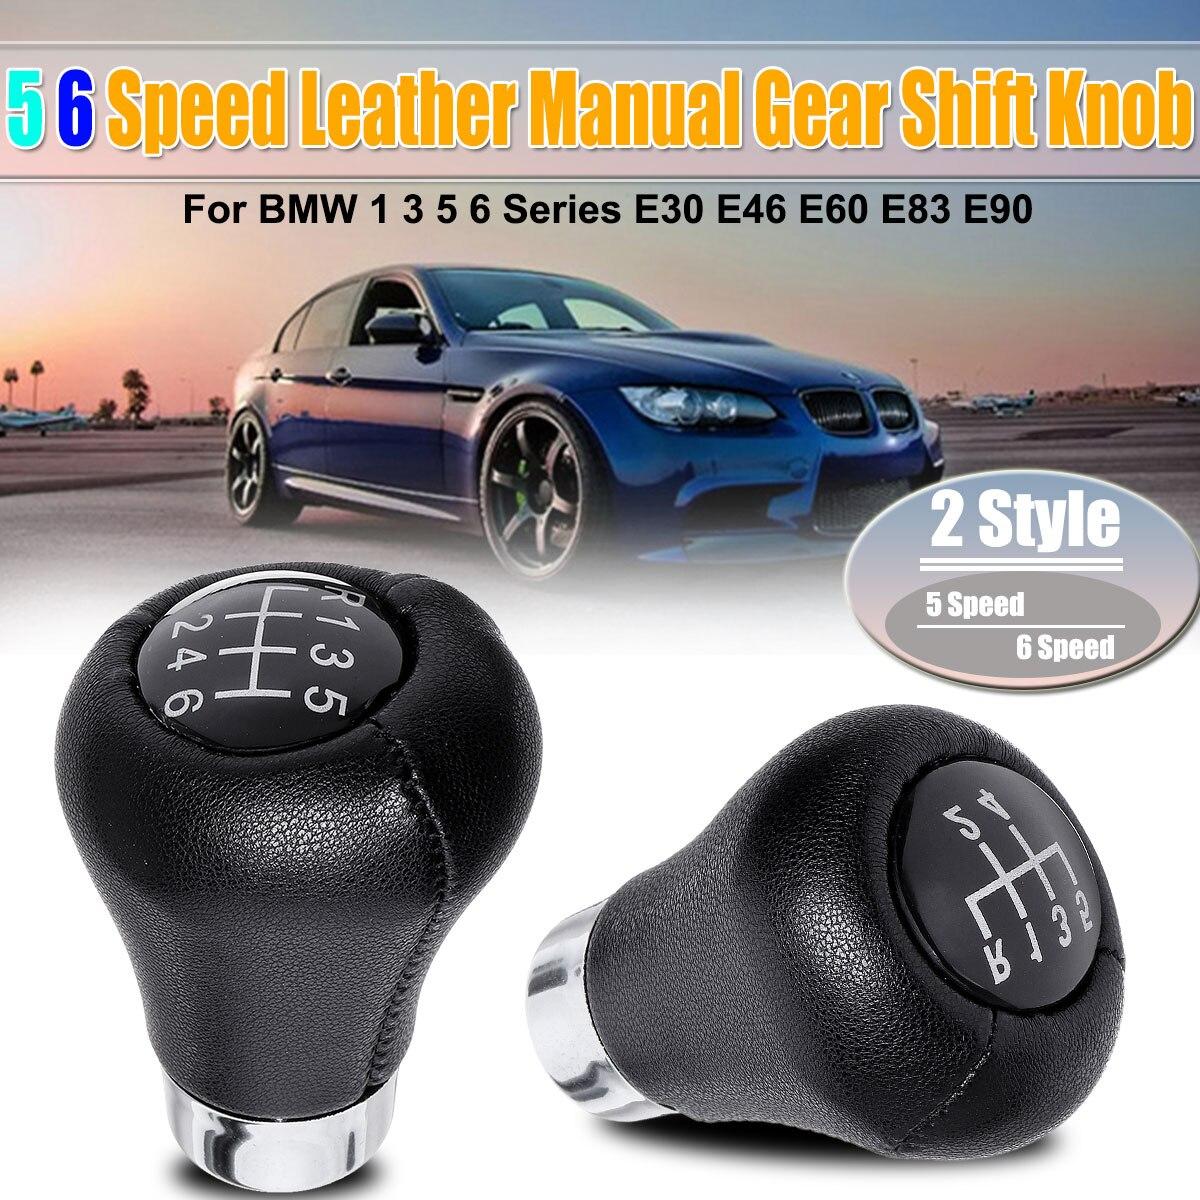 FITS BMW E30 E36 E34 M GEAR SHIFT BOOT GAITER LEATHER NEW Vehicle Parts & Accessories